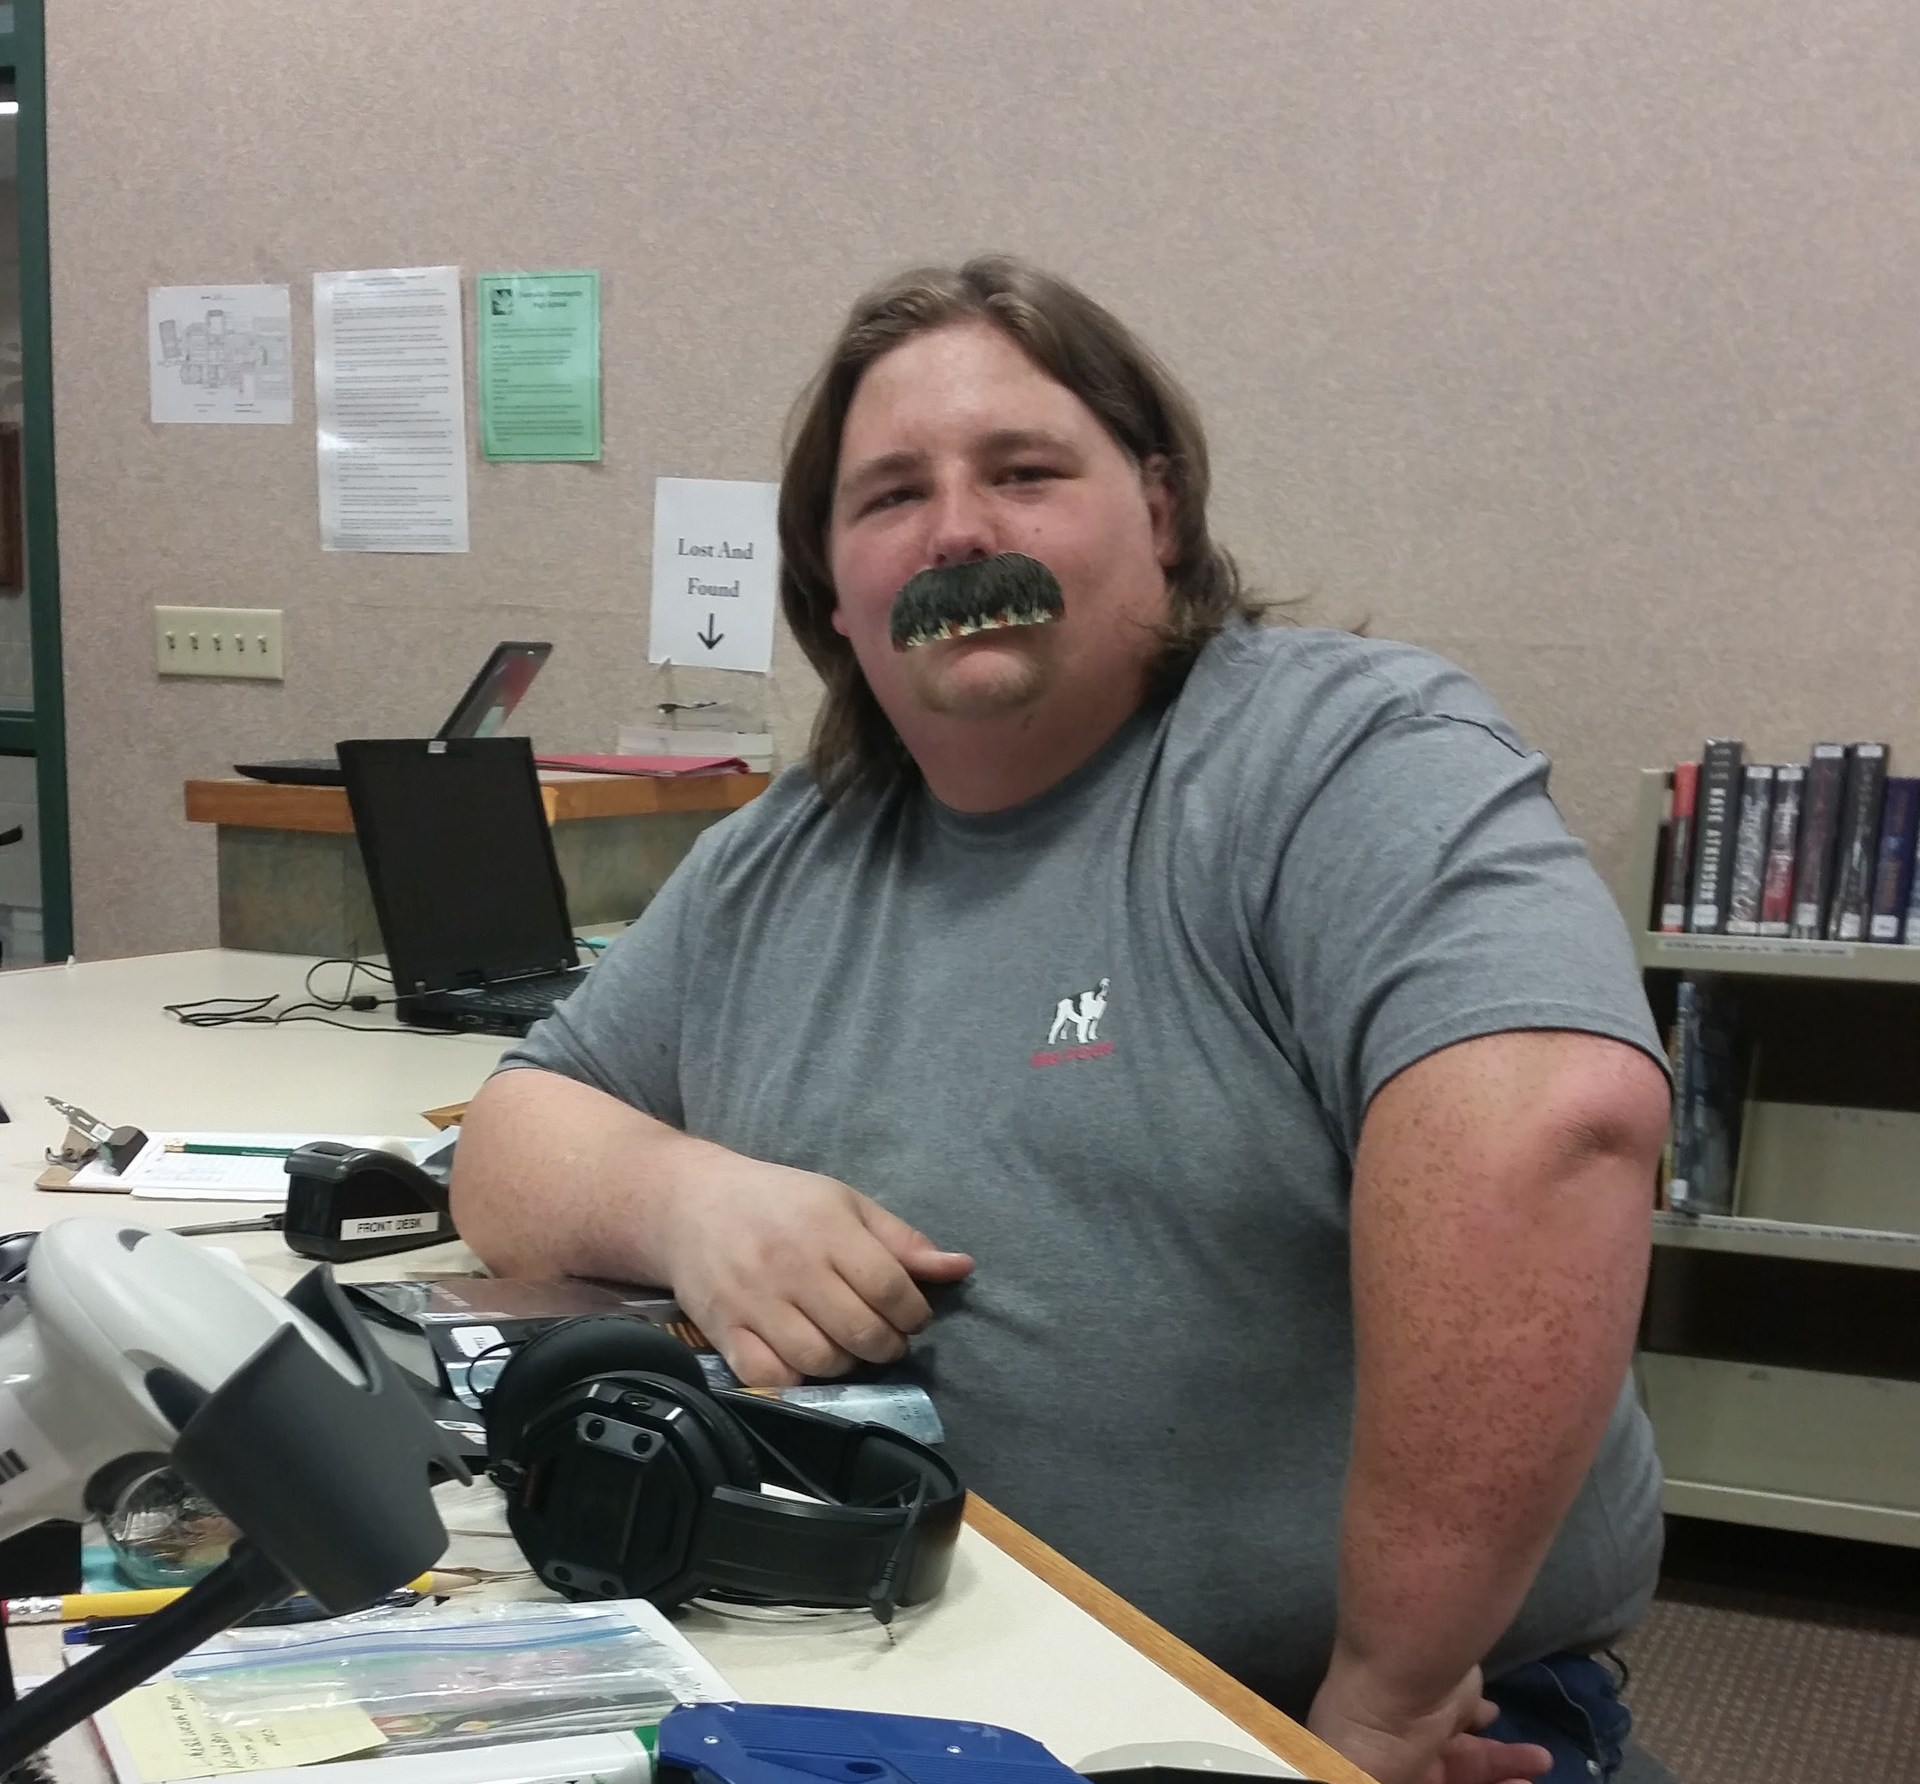 Brock Pellam Mustache